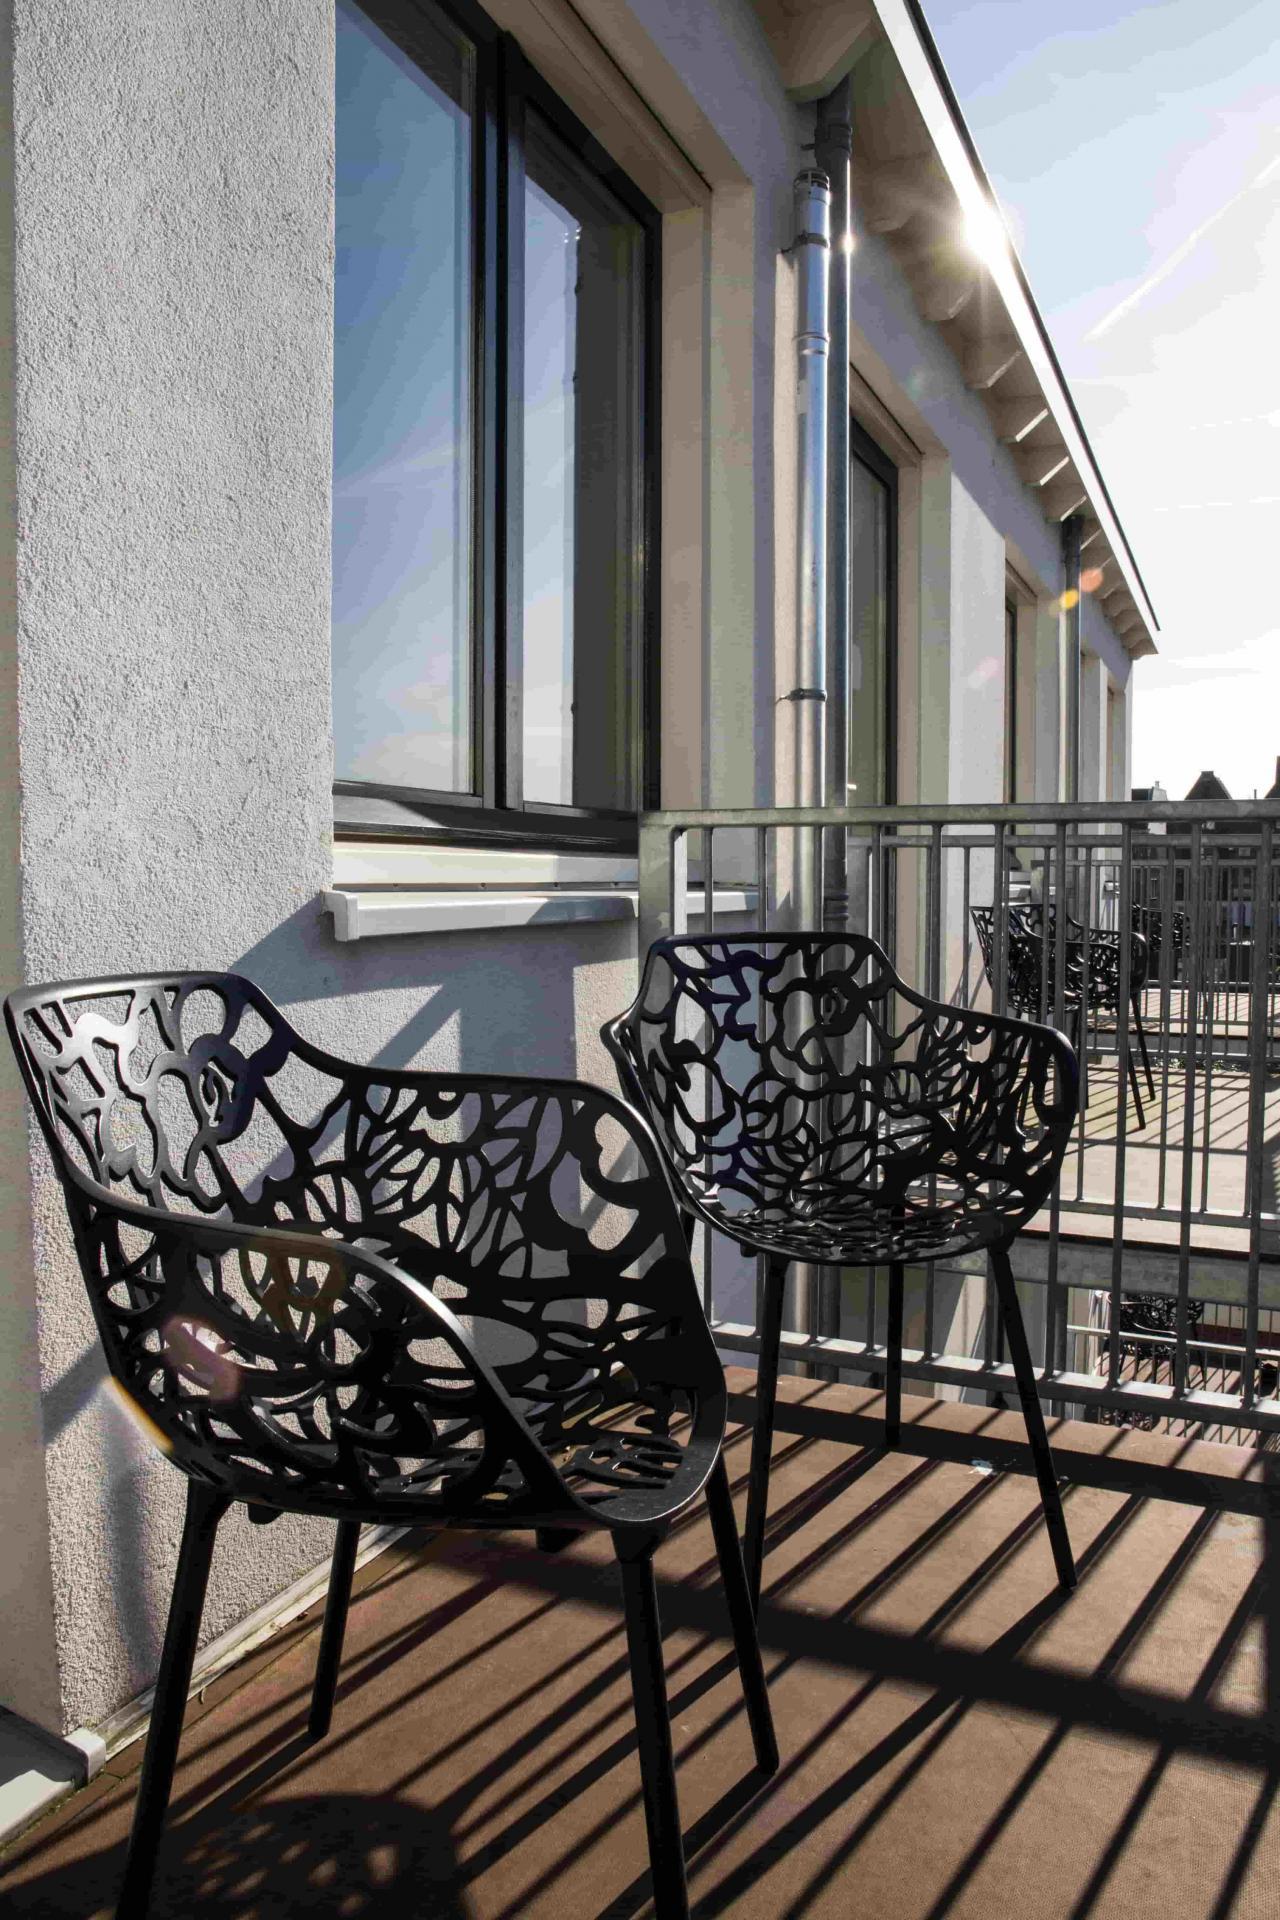 Balcony at Old Center Apartments, Amsterdam - Cityden